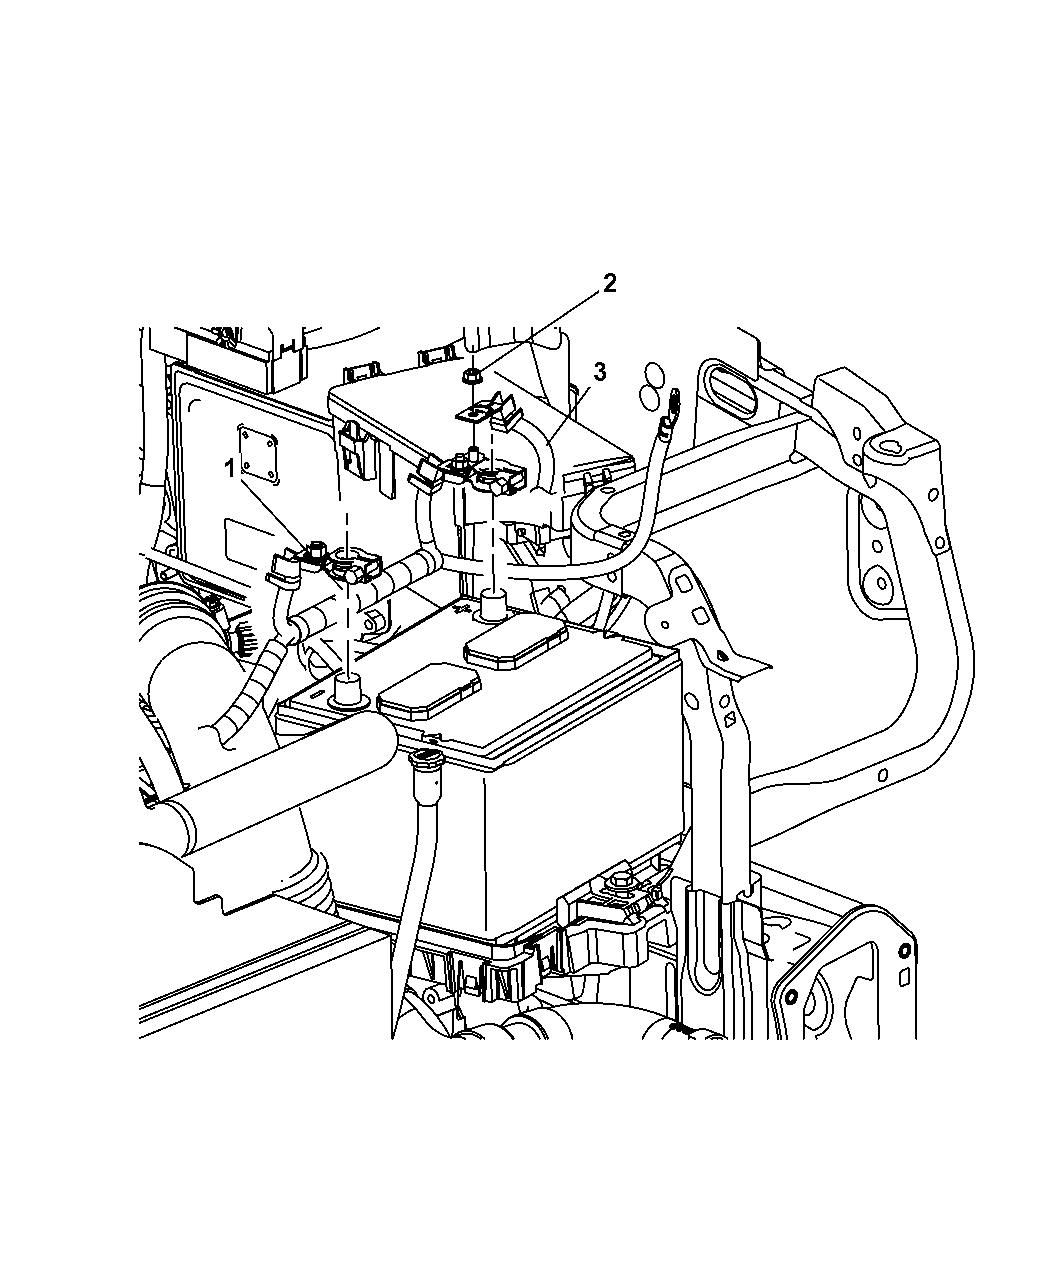 2013 jeep patriot battery wiring mopar parts giant. Black Bedroom Furniture Sets. Home Design Ideas